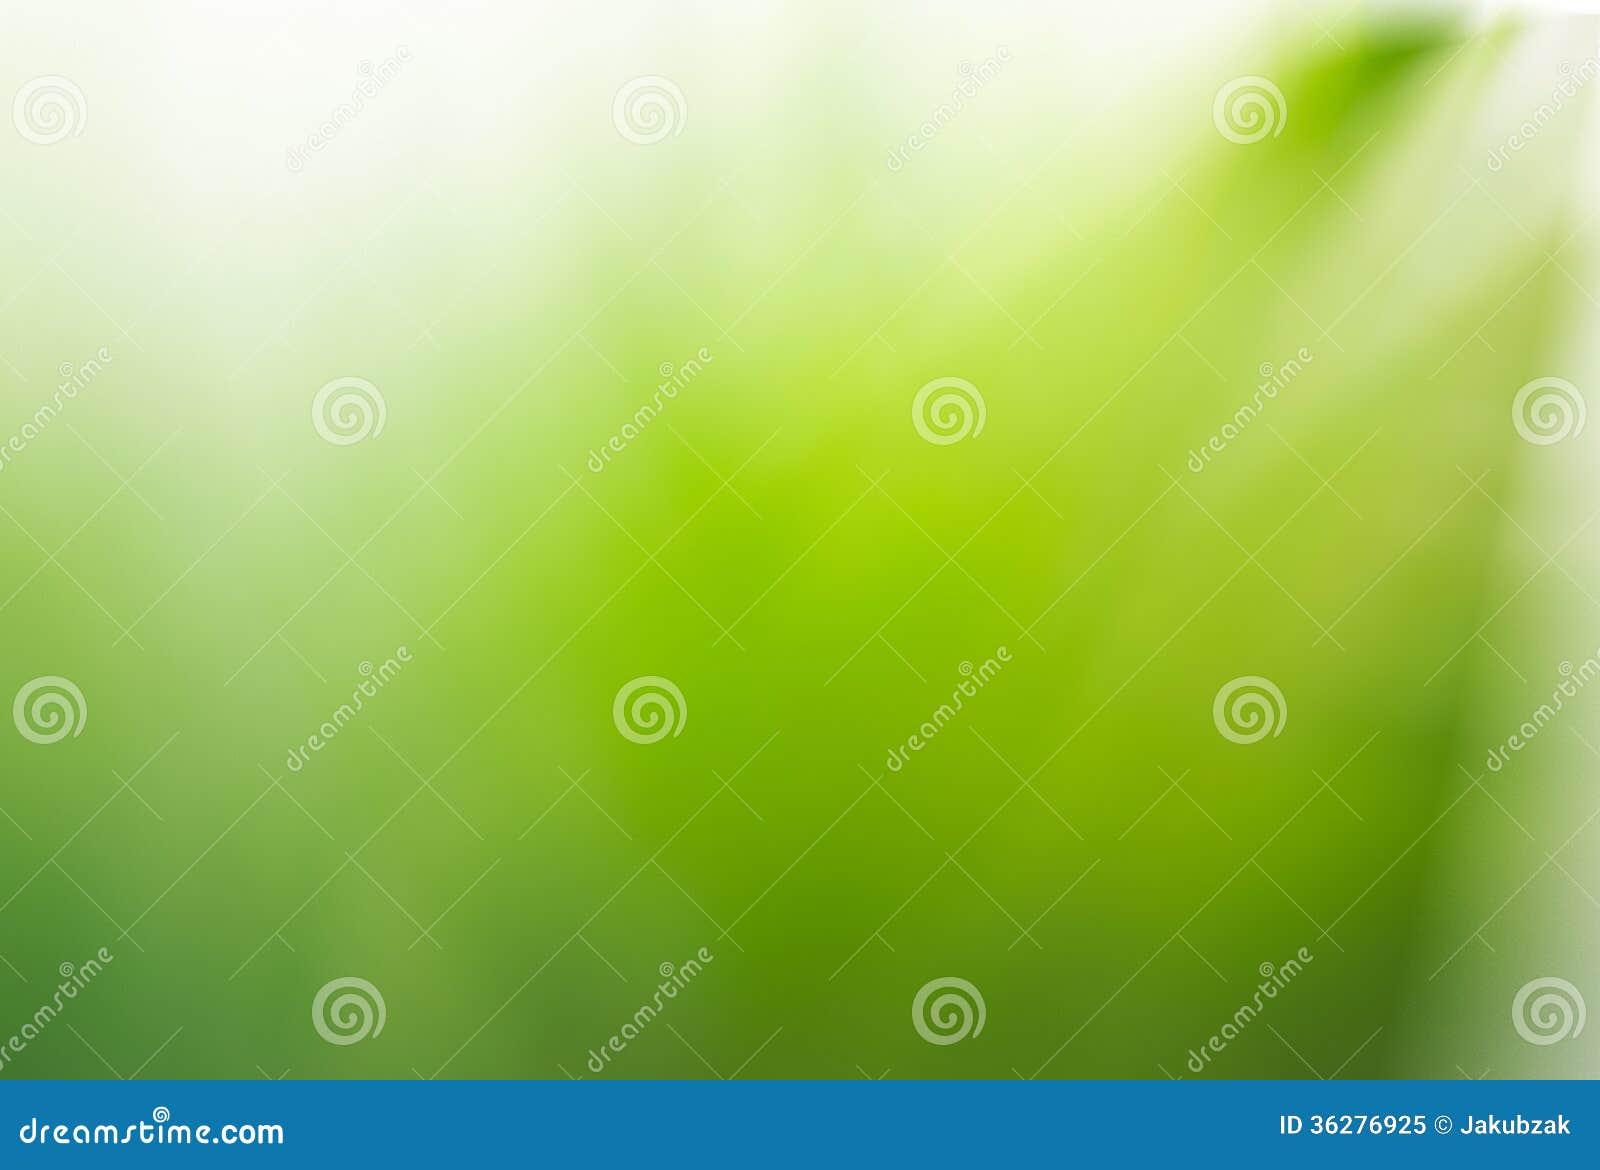 light green background design - photo #14